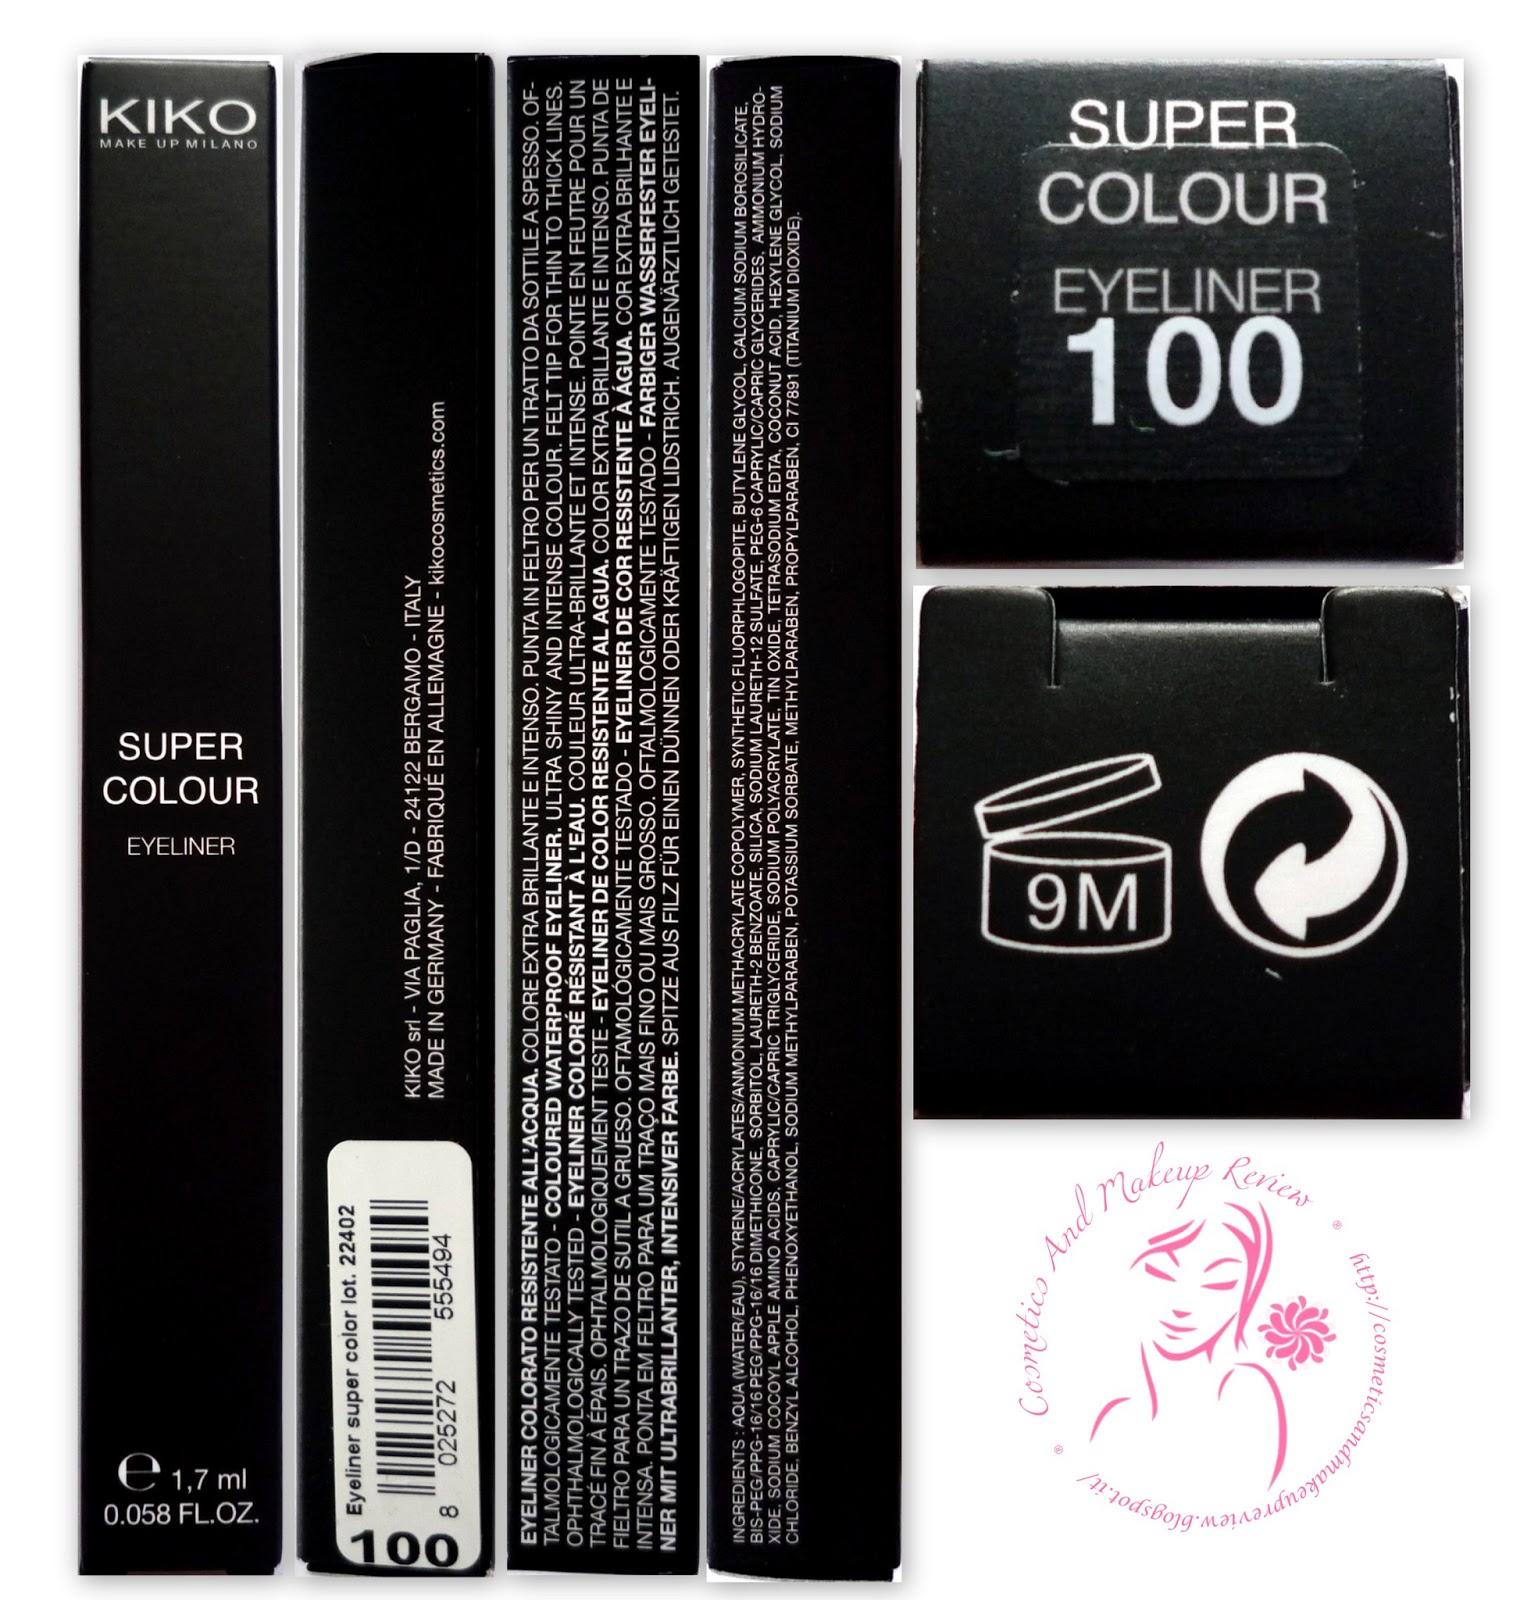 KIKO - Super Colour Eyeliner - packaging